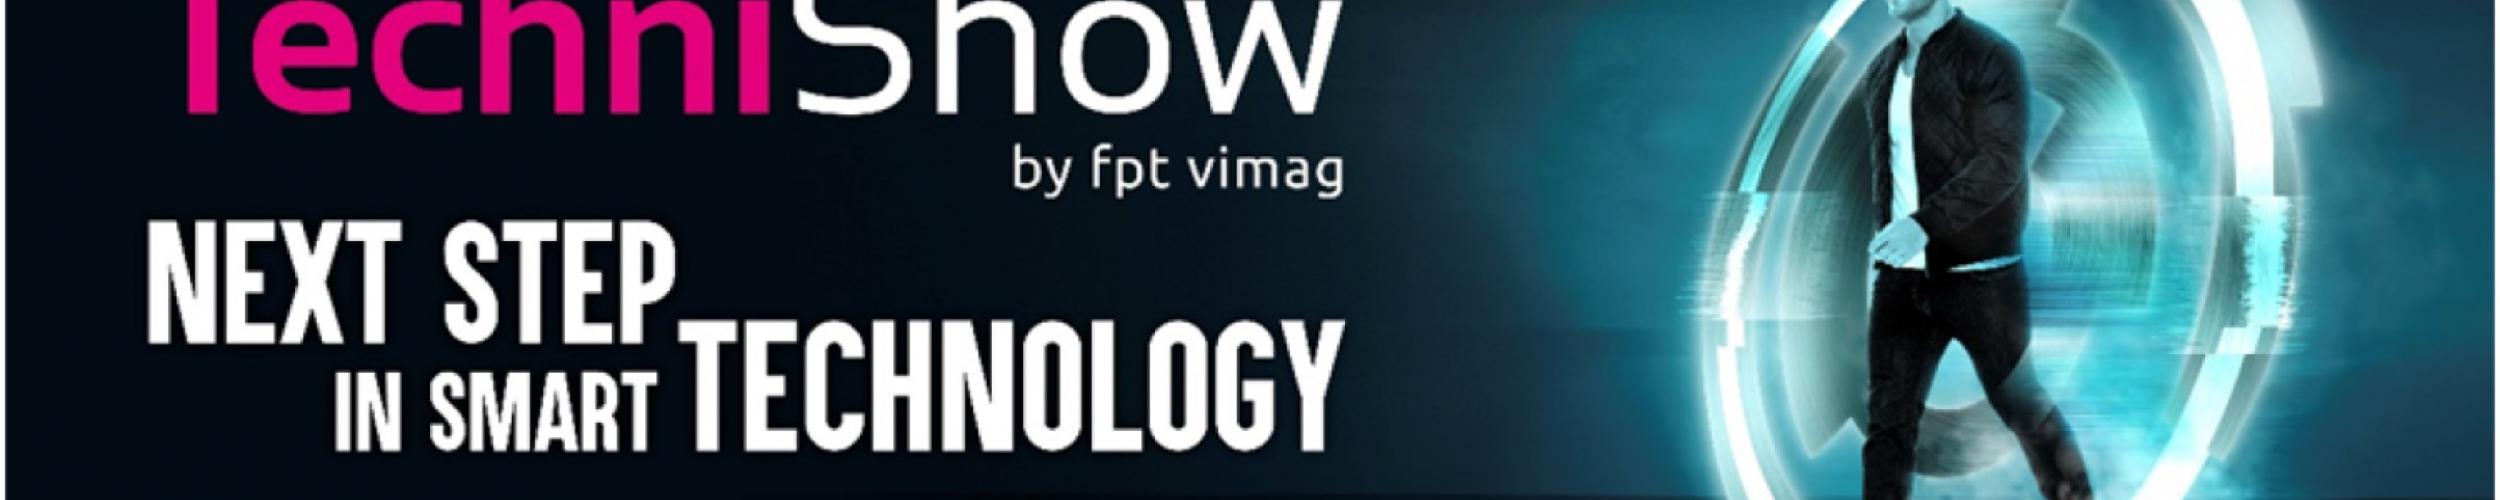 PRODUTEC BV op de Techni Show 2022 15 t/m 18 Maart